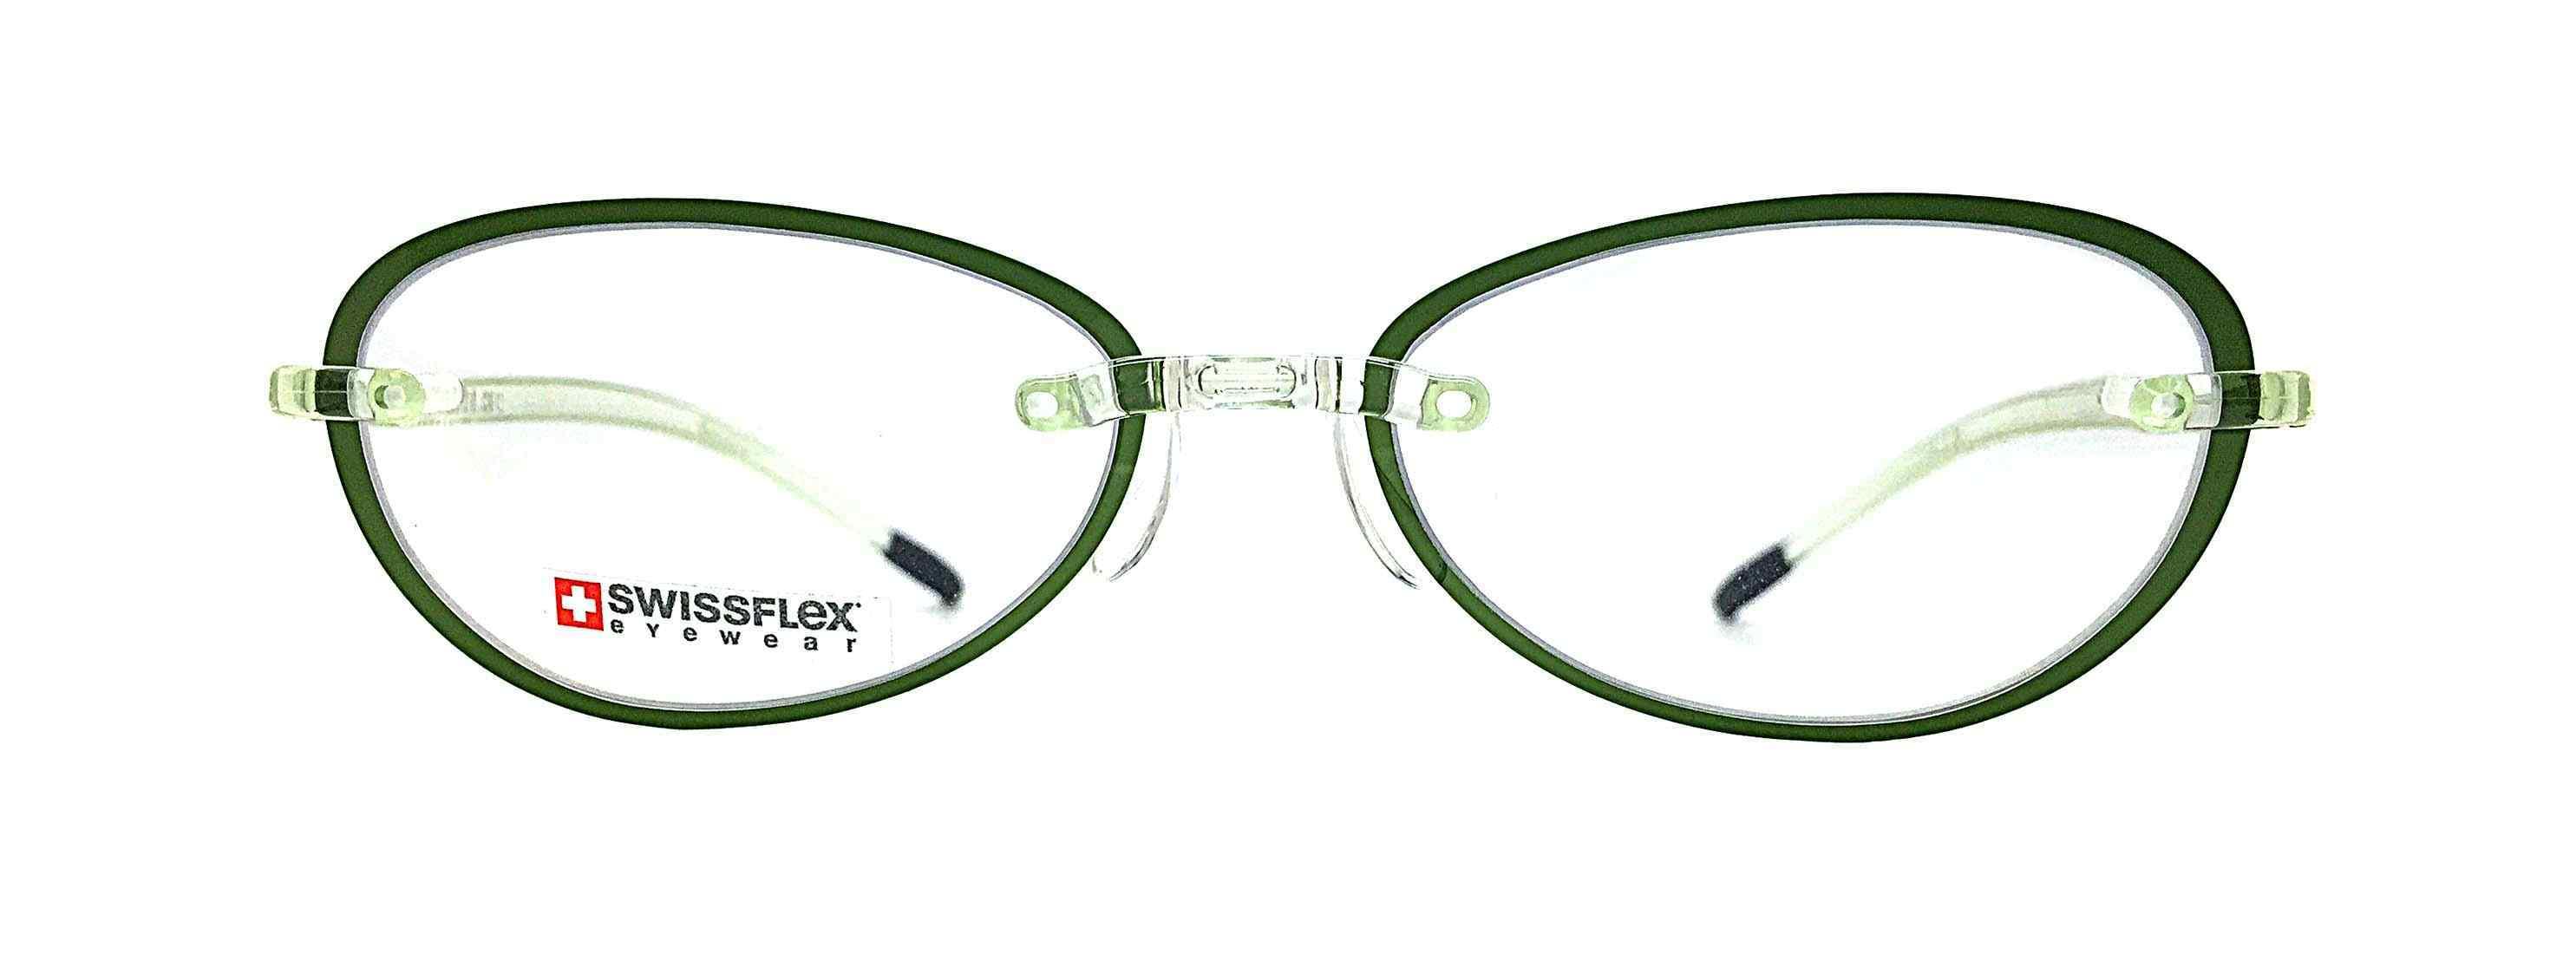 SwissFlex spectacles: SwissFlex Contur 203 52 1 2970x1100